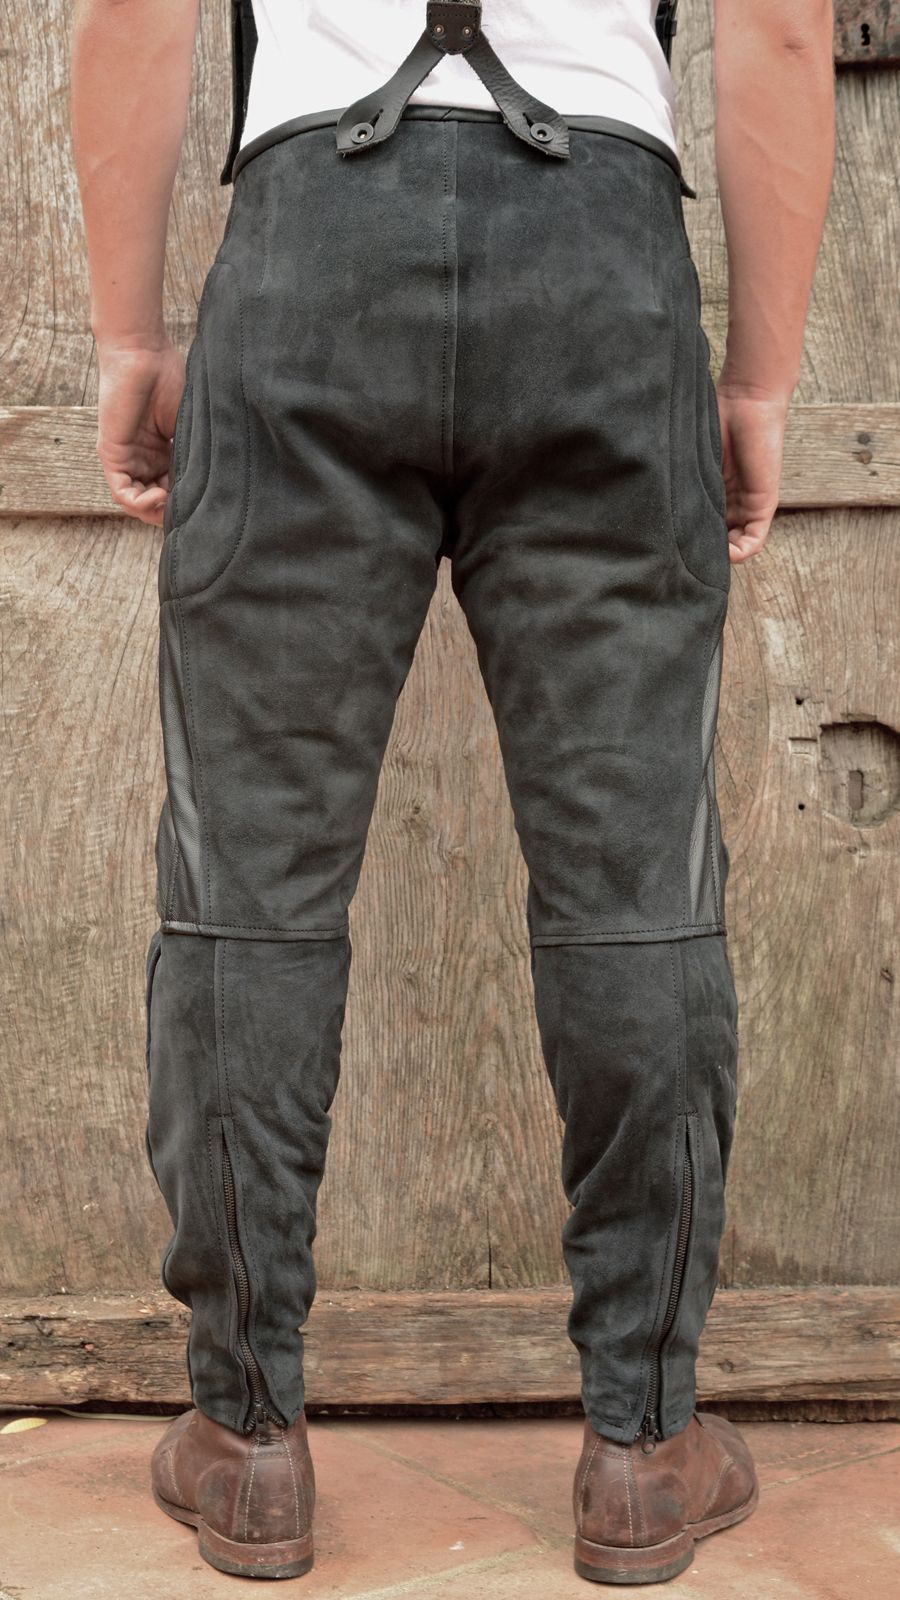 Rascal Leather Motorcycle Pants Black | Cl | Pinterest ...